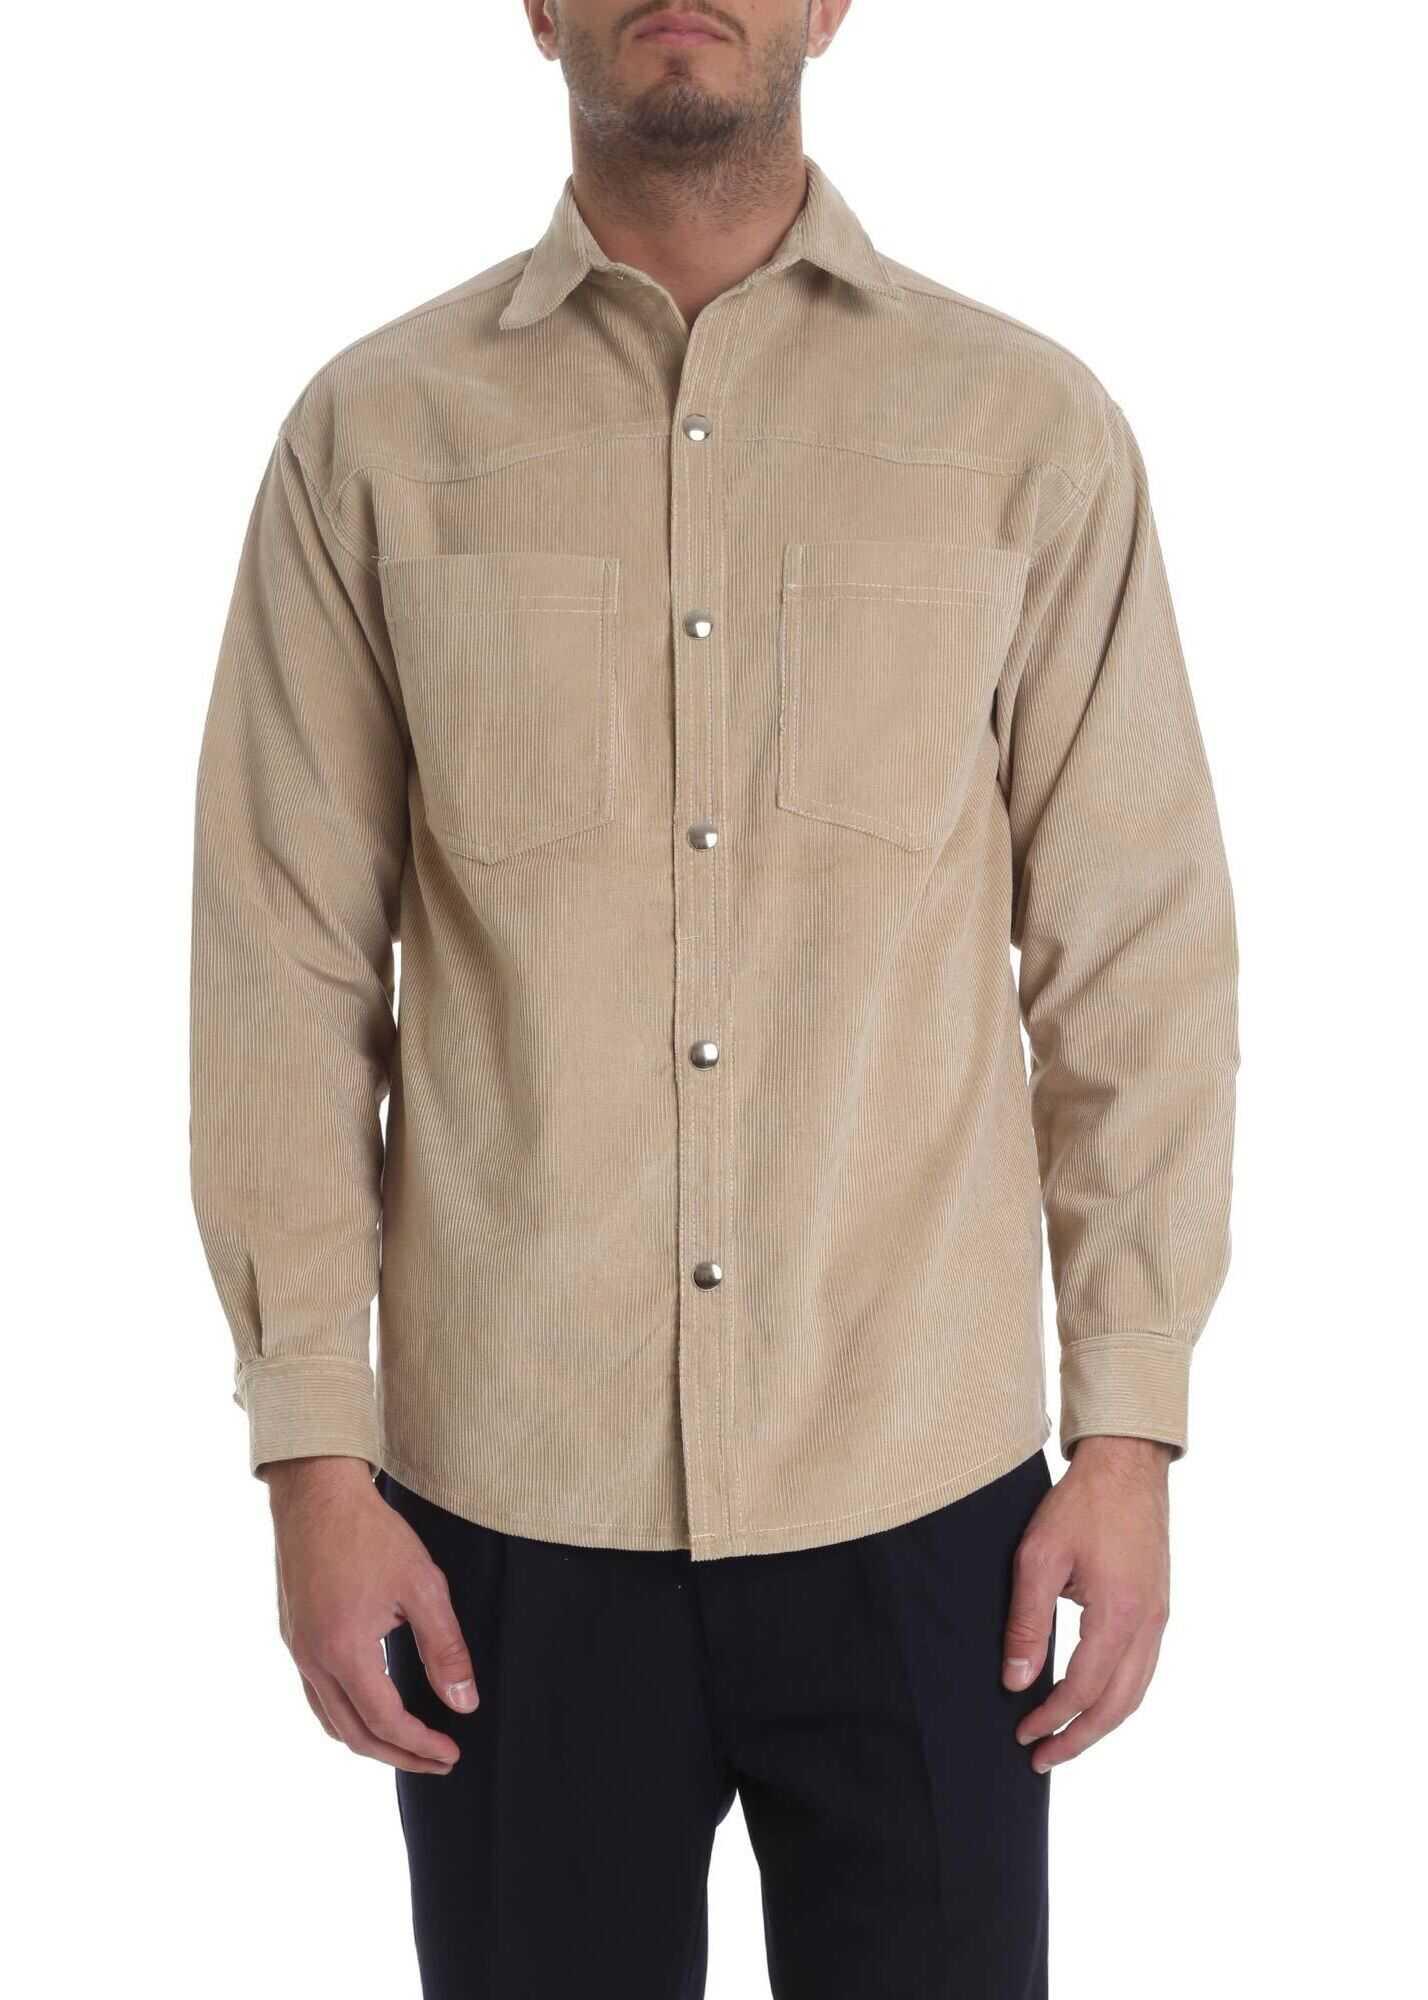 Ribbon Clothing Corduroy Cotton Shirt In Beige Beige imagine